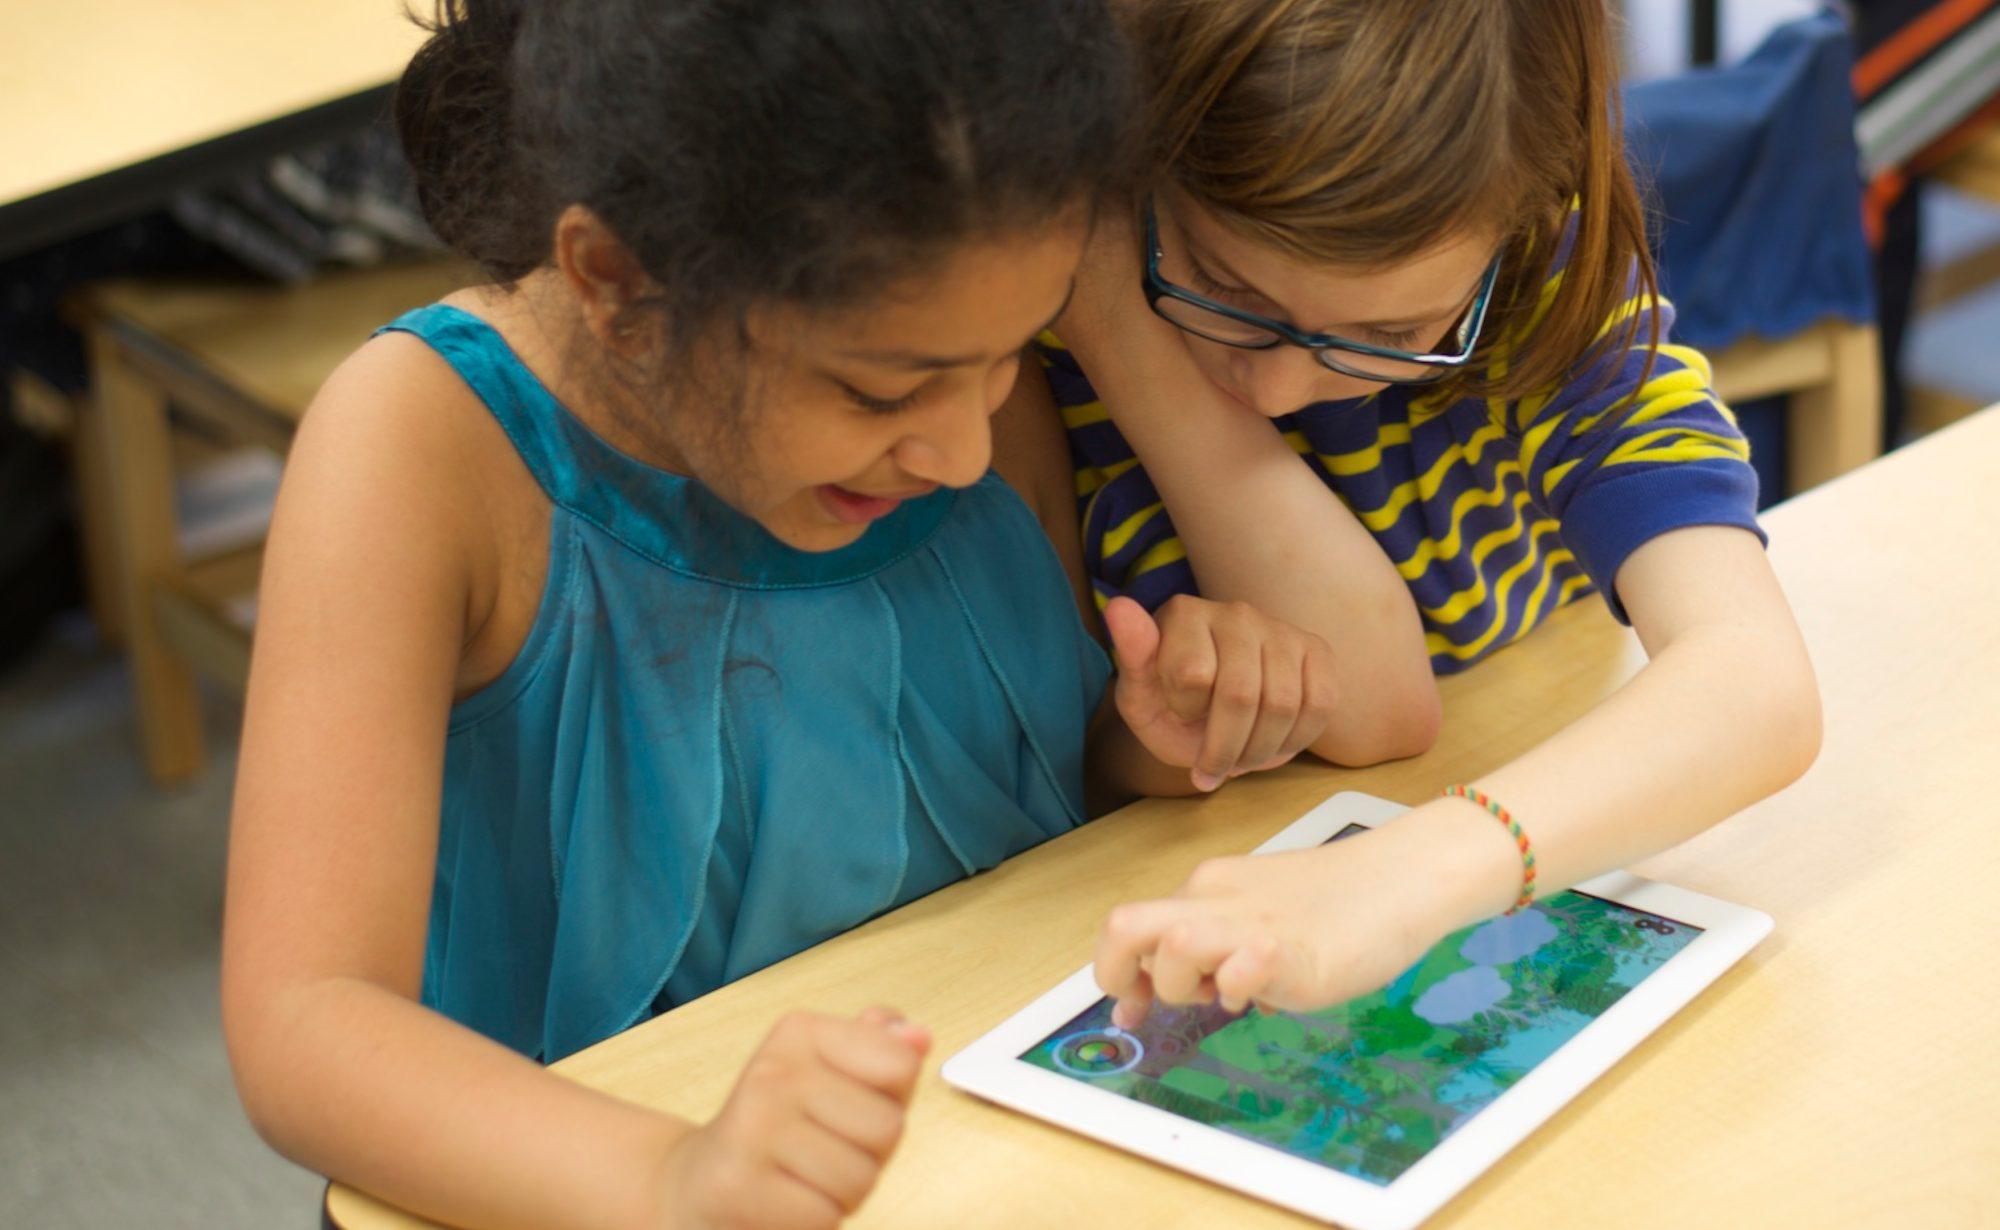 Kids playing Tinybop Plants. Photo Copyright Tinybop 2014